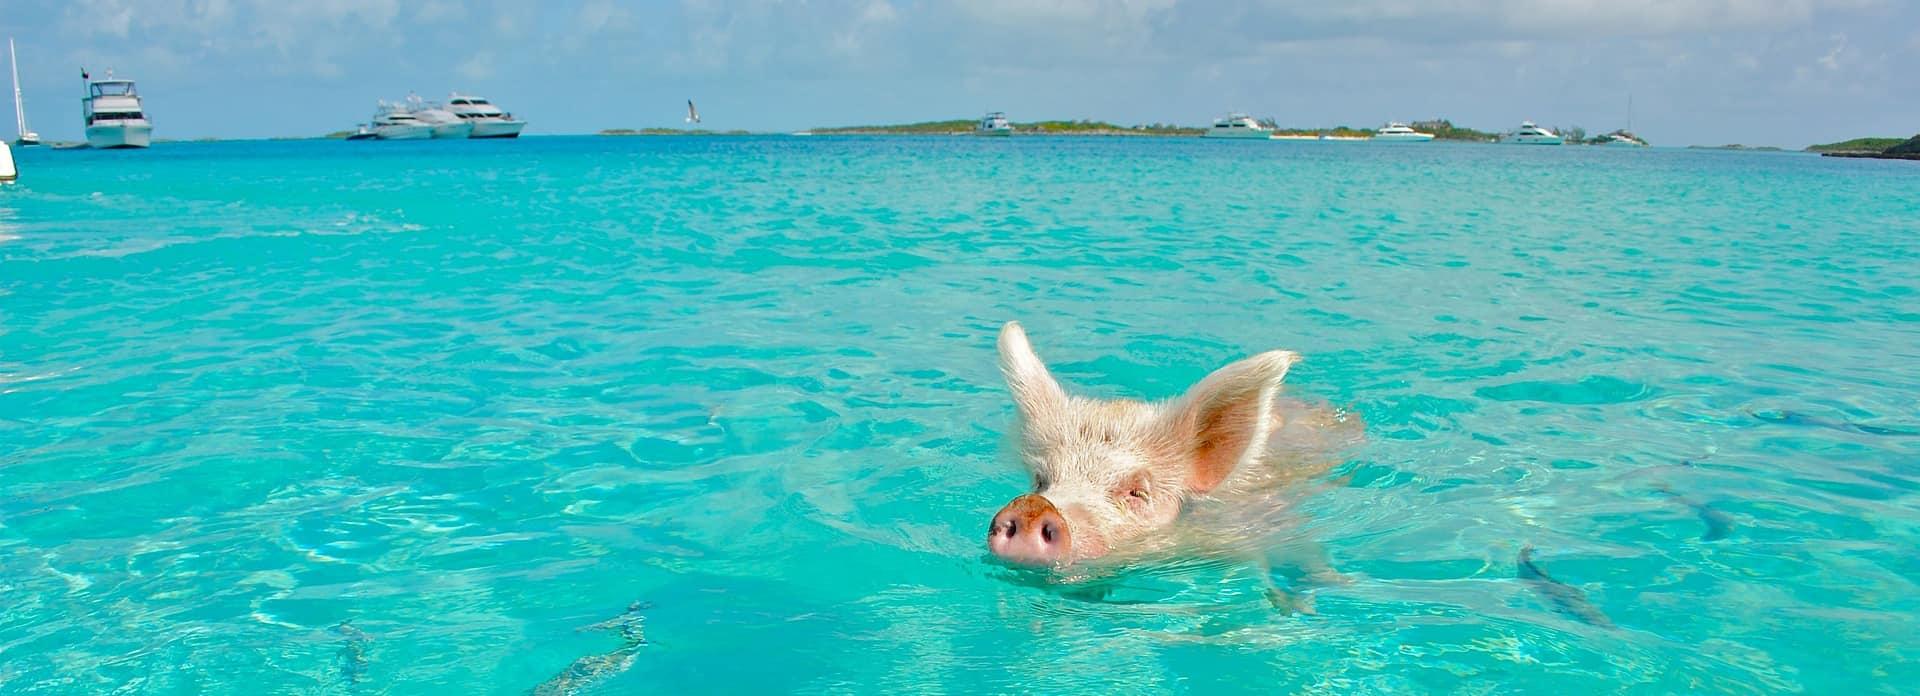 decouvrir les bahamas